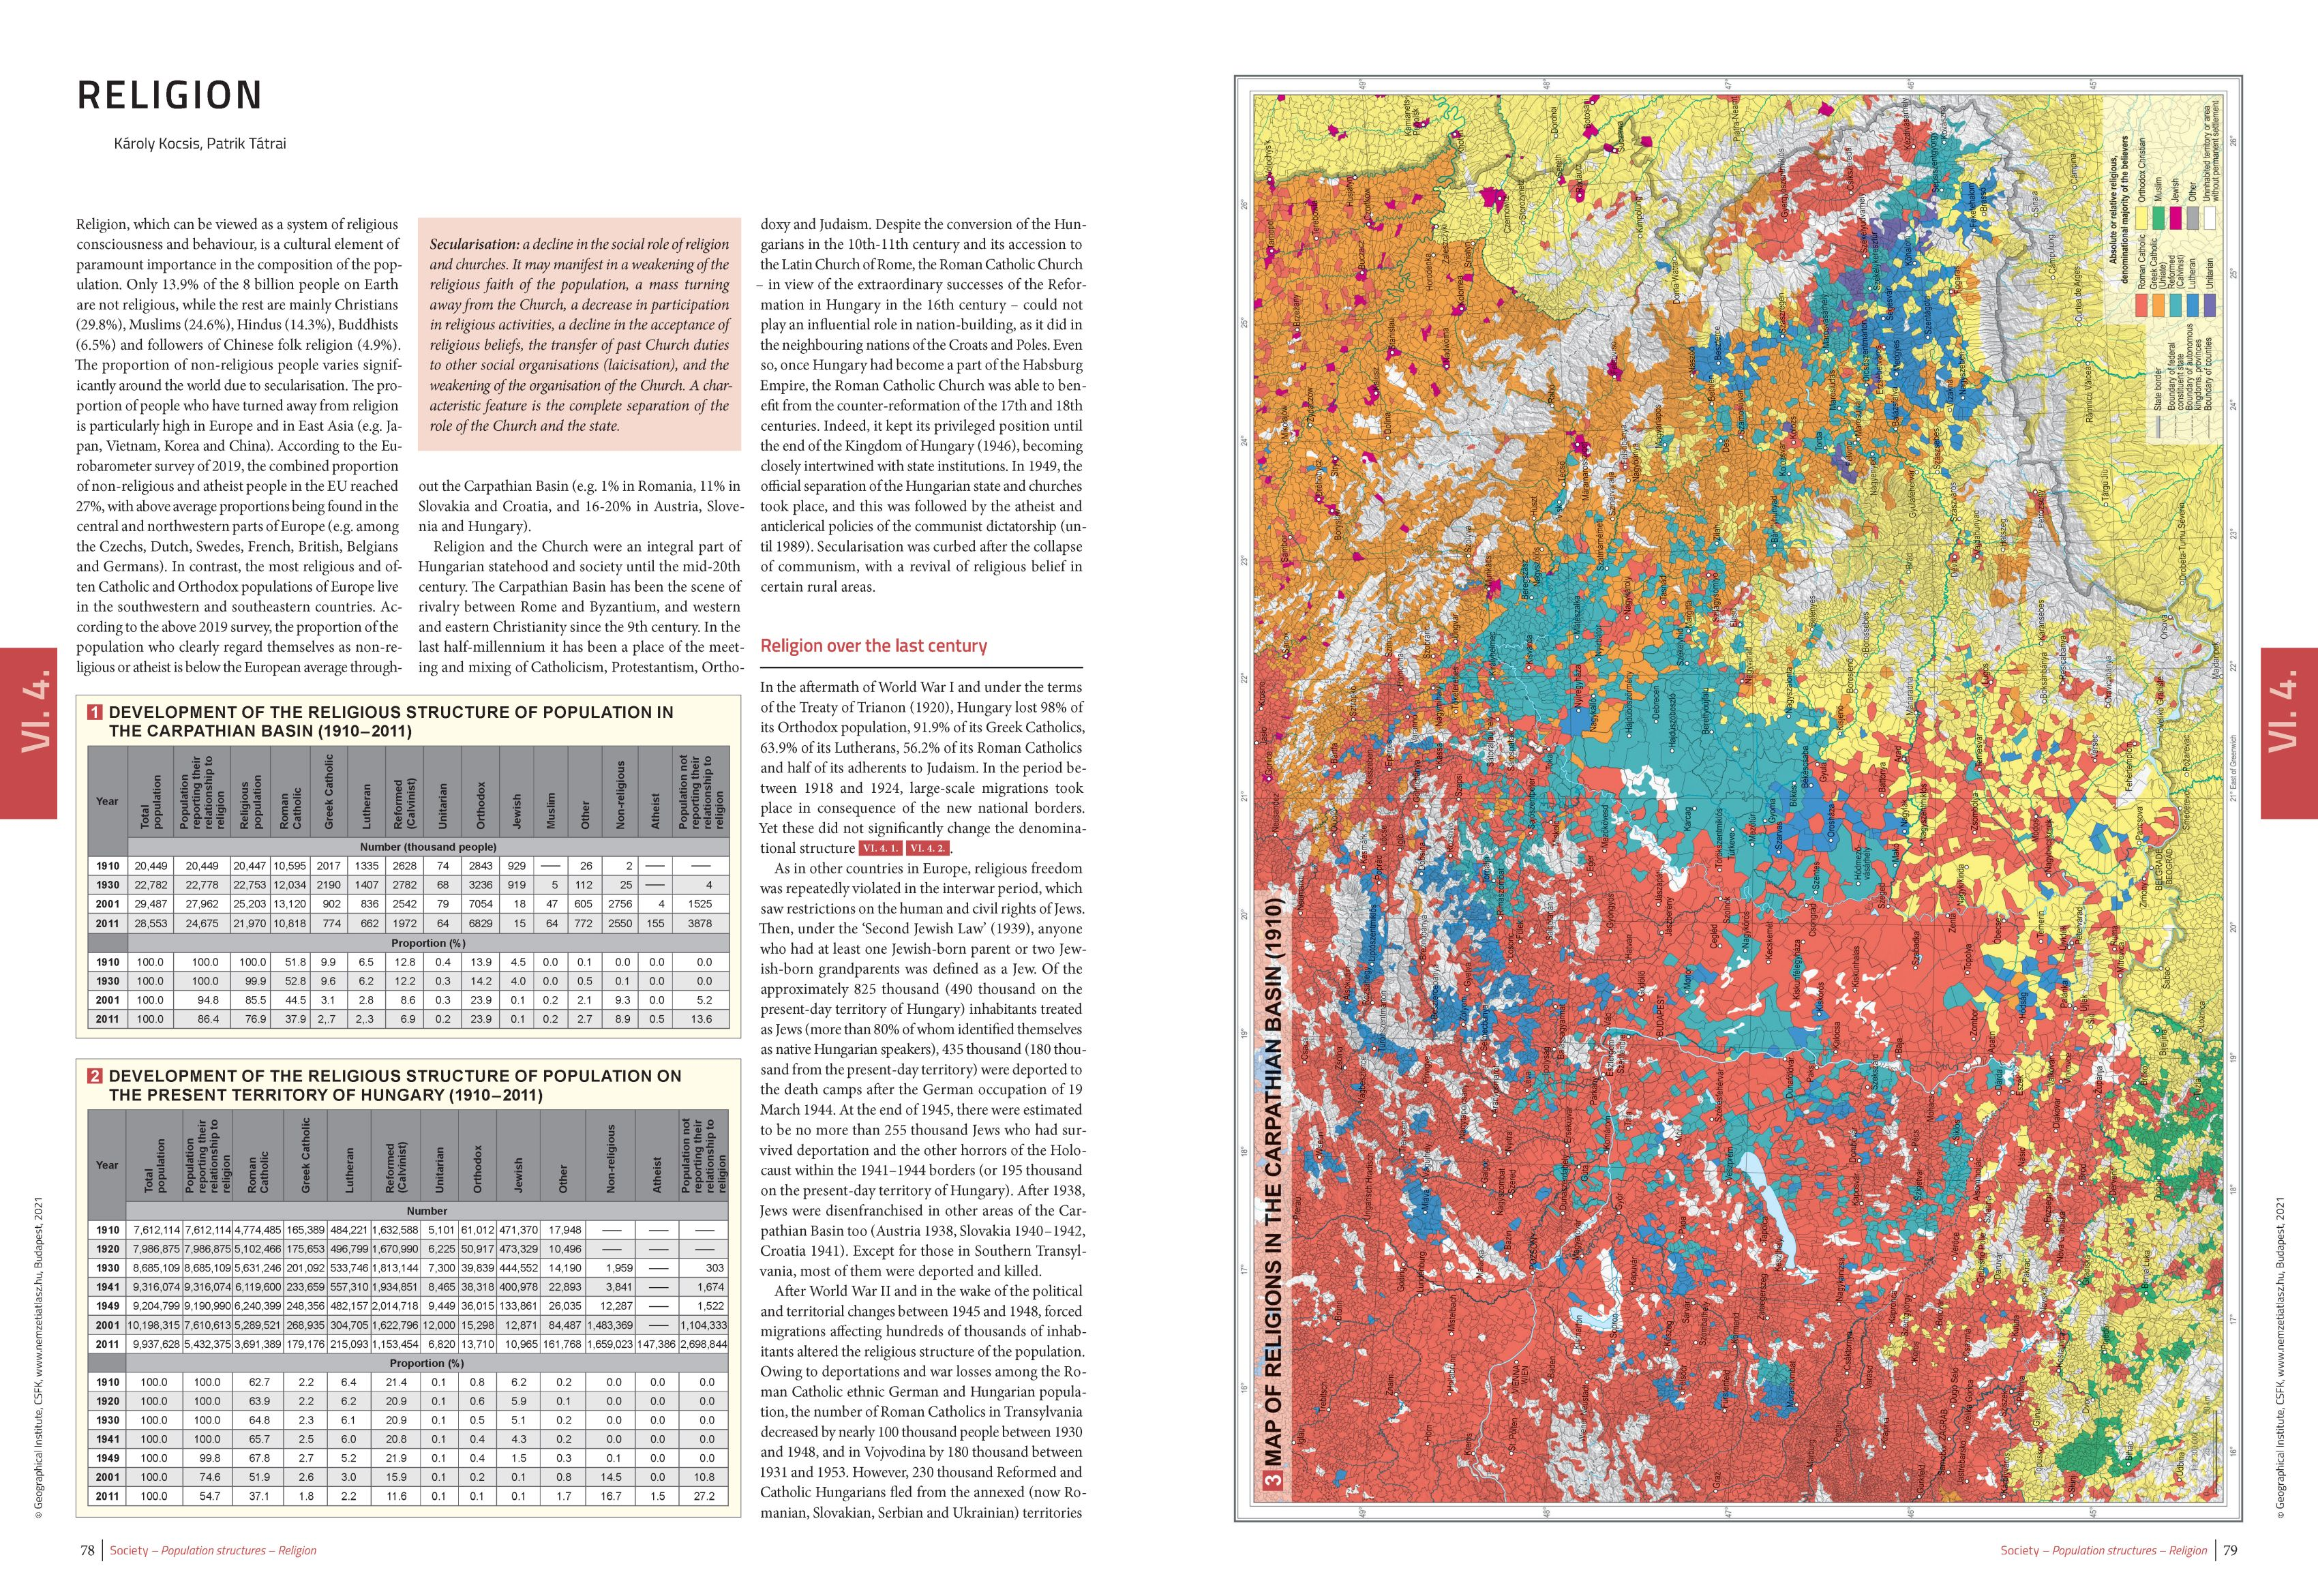 National atlas vol. 3. Society: Sample 4.